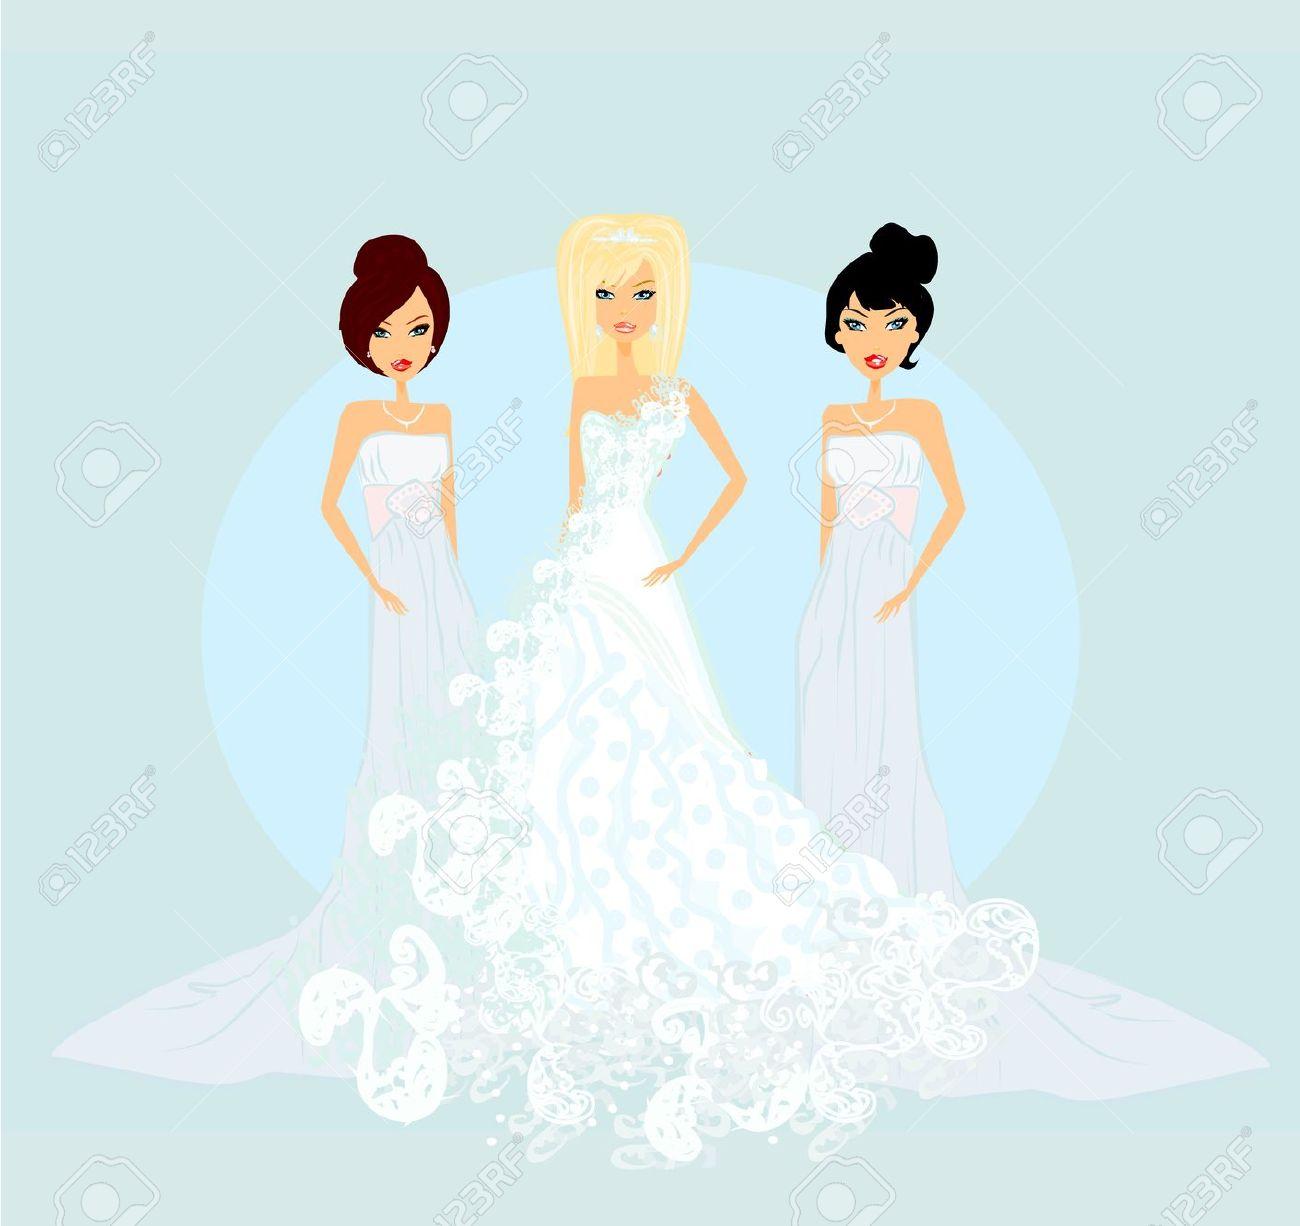 Bride clipart bride bridesmaid Bridesmaid: Free with with Images